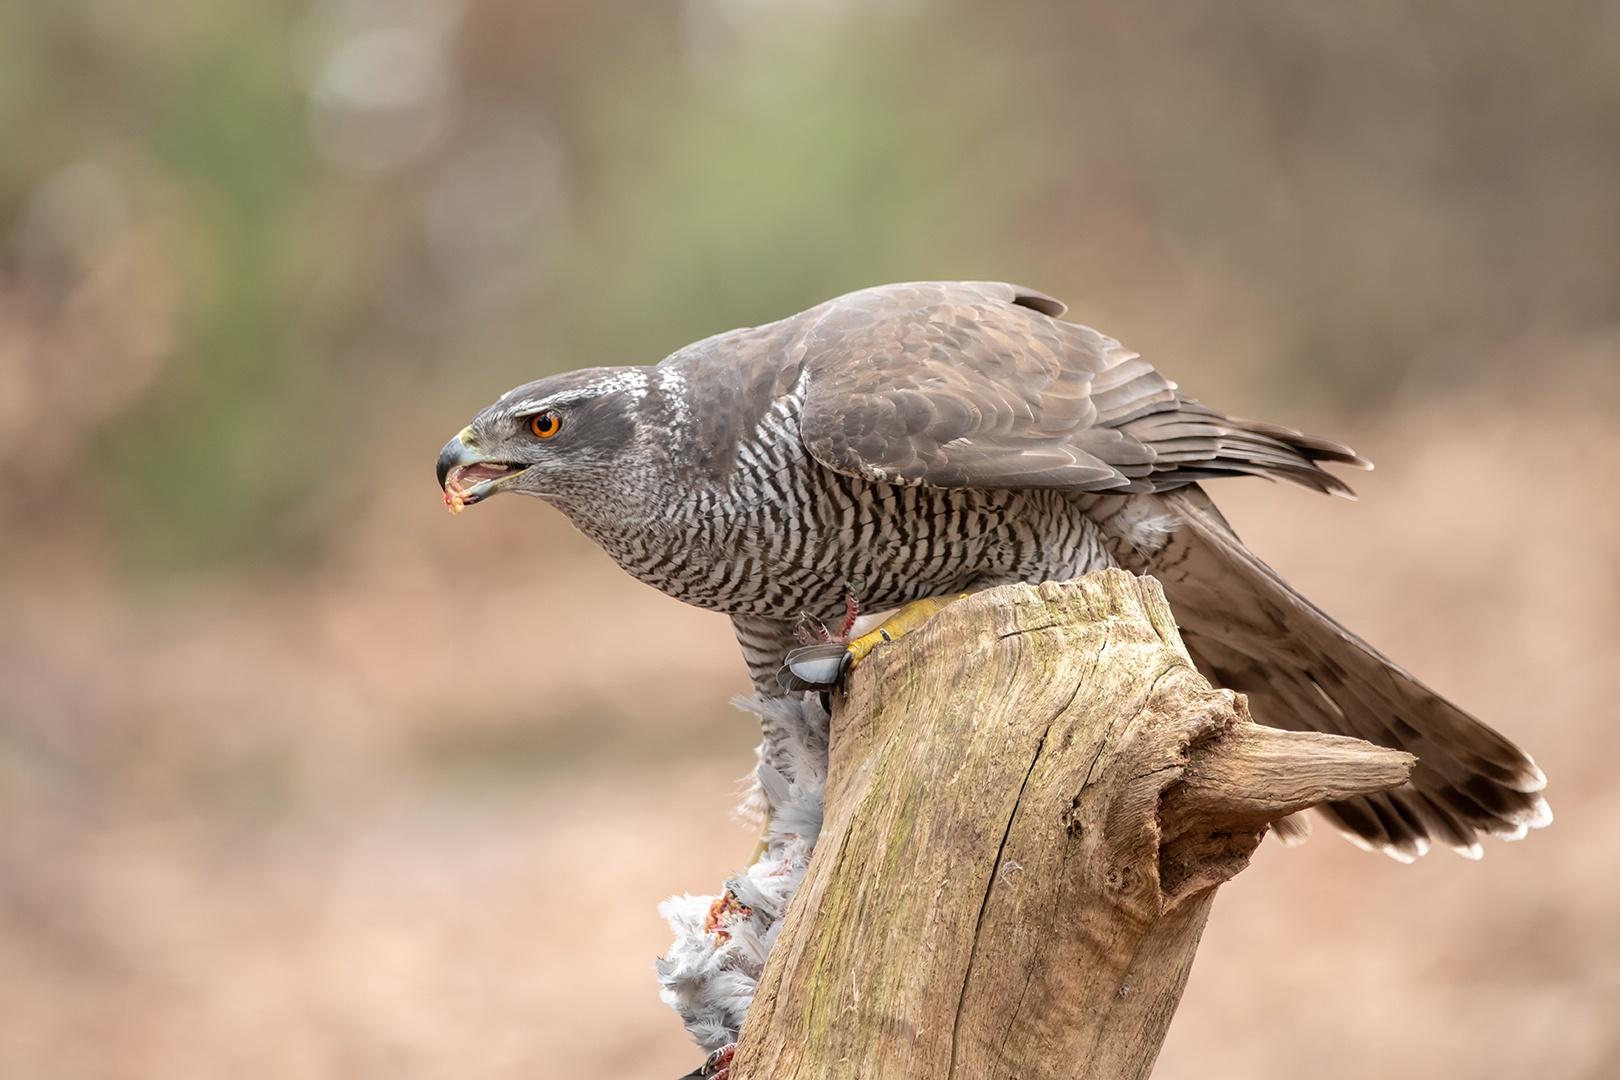 natasja-havik-met-prooi-duif-2916